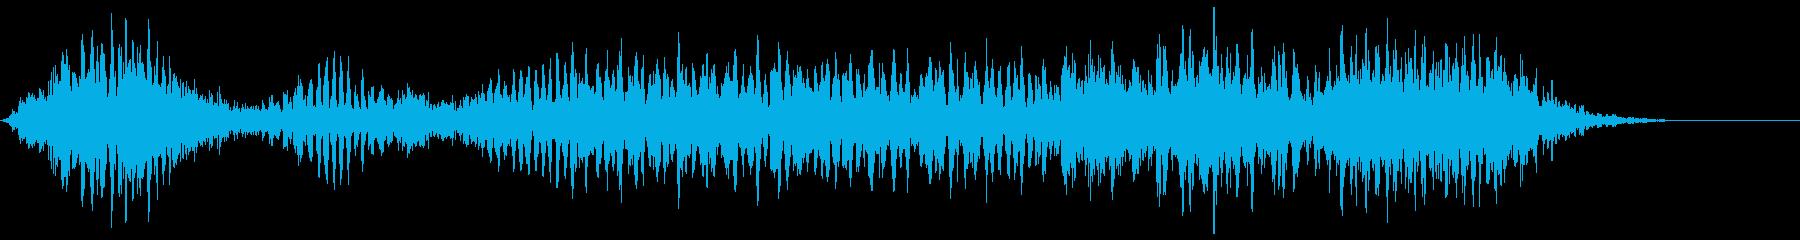 Hufo ... (moving, suspicious, uncomfortable)'s reproduced waveform